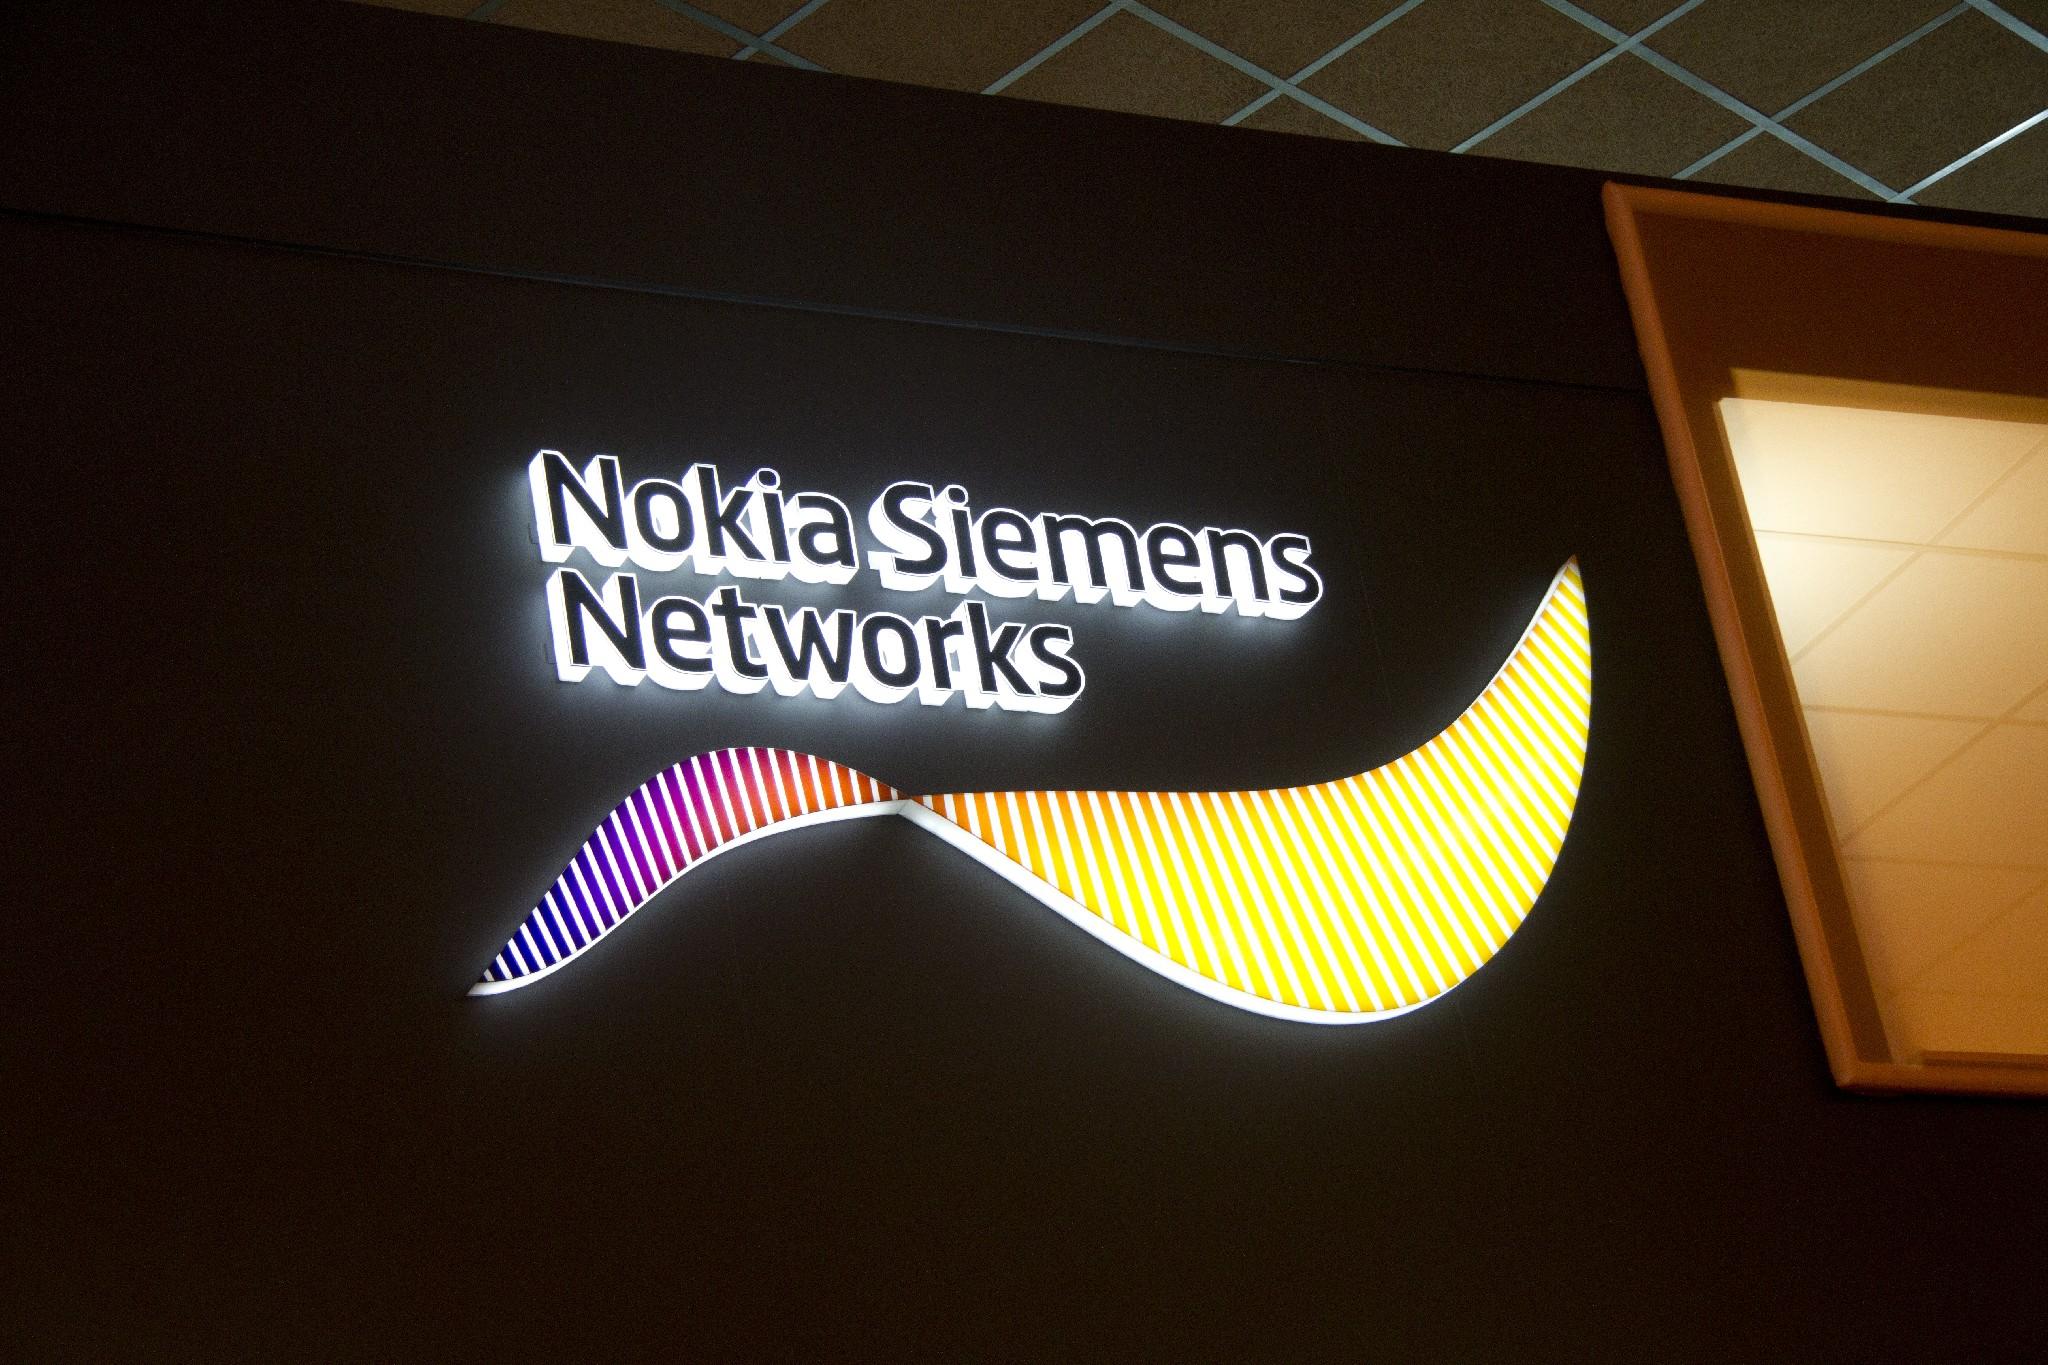 NSN logo Mobile World Congress Nokia Siemens